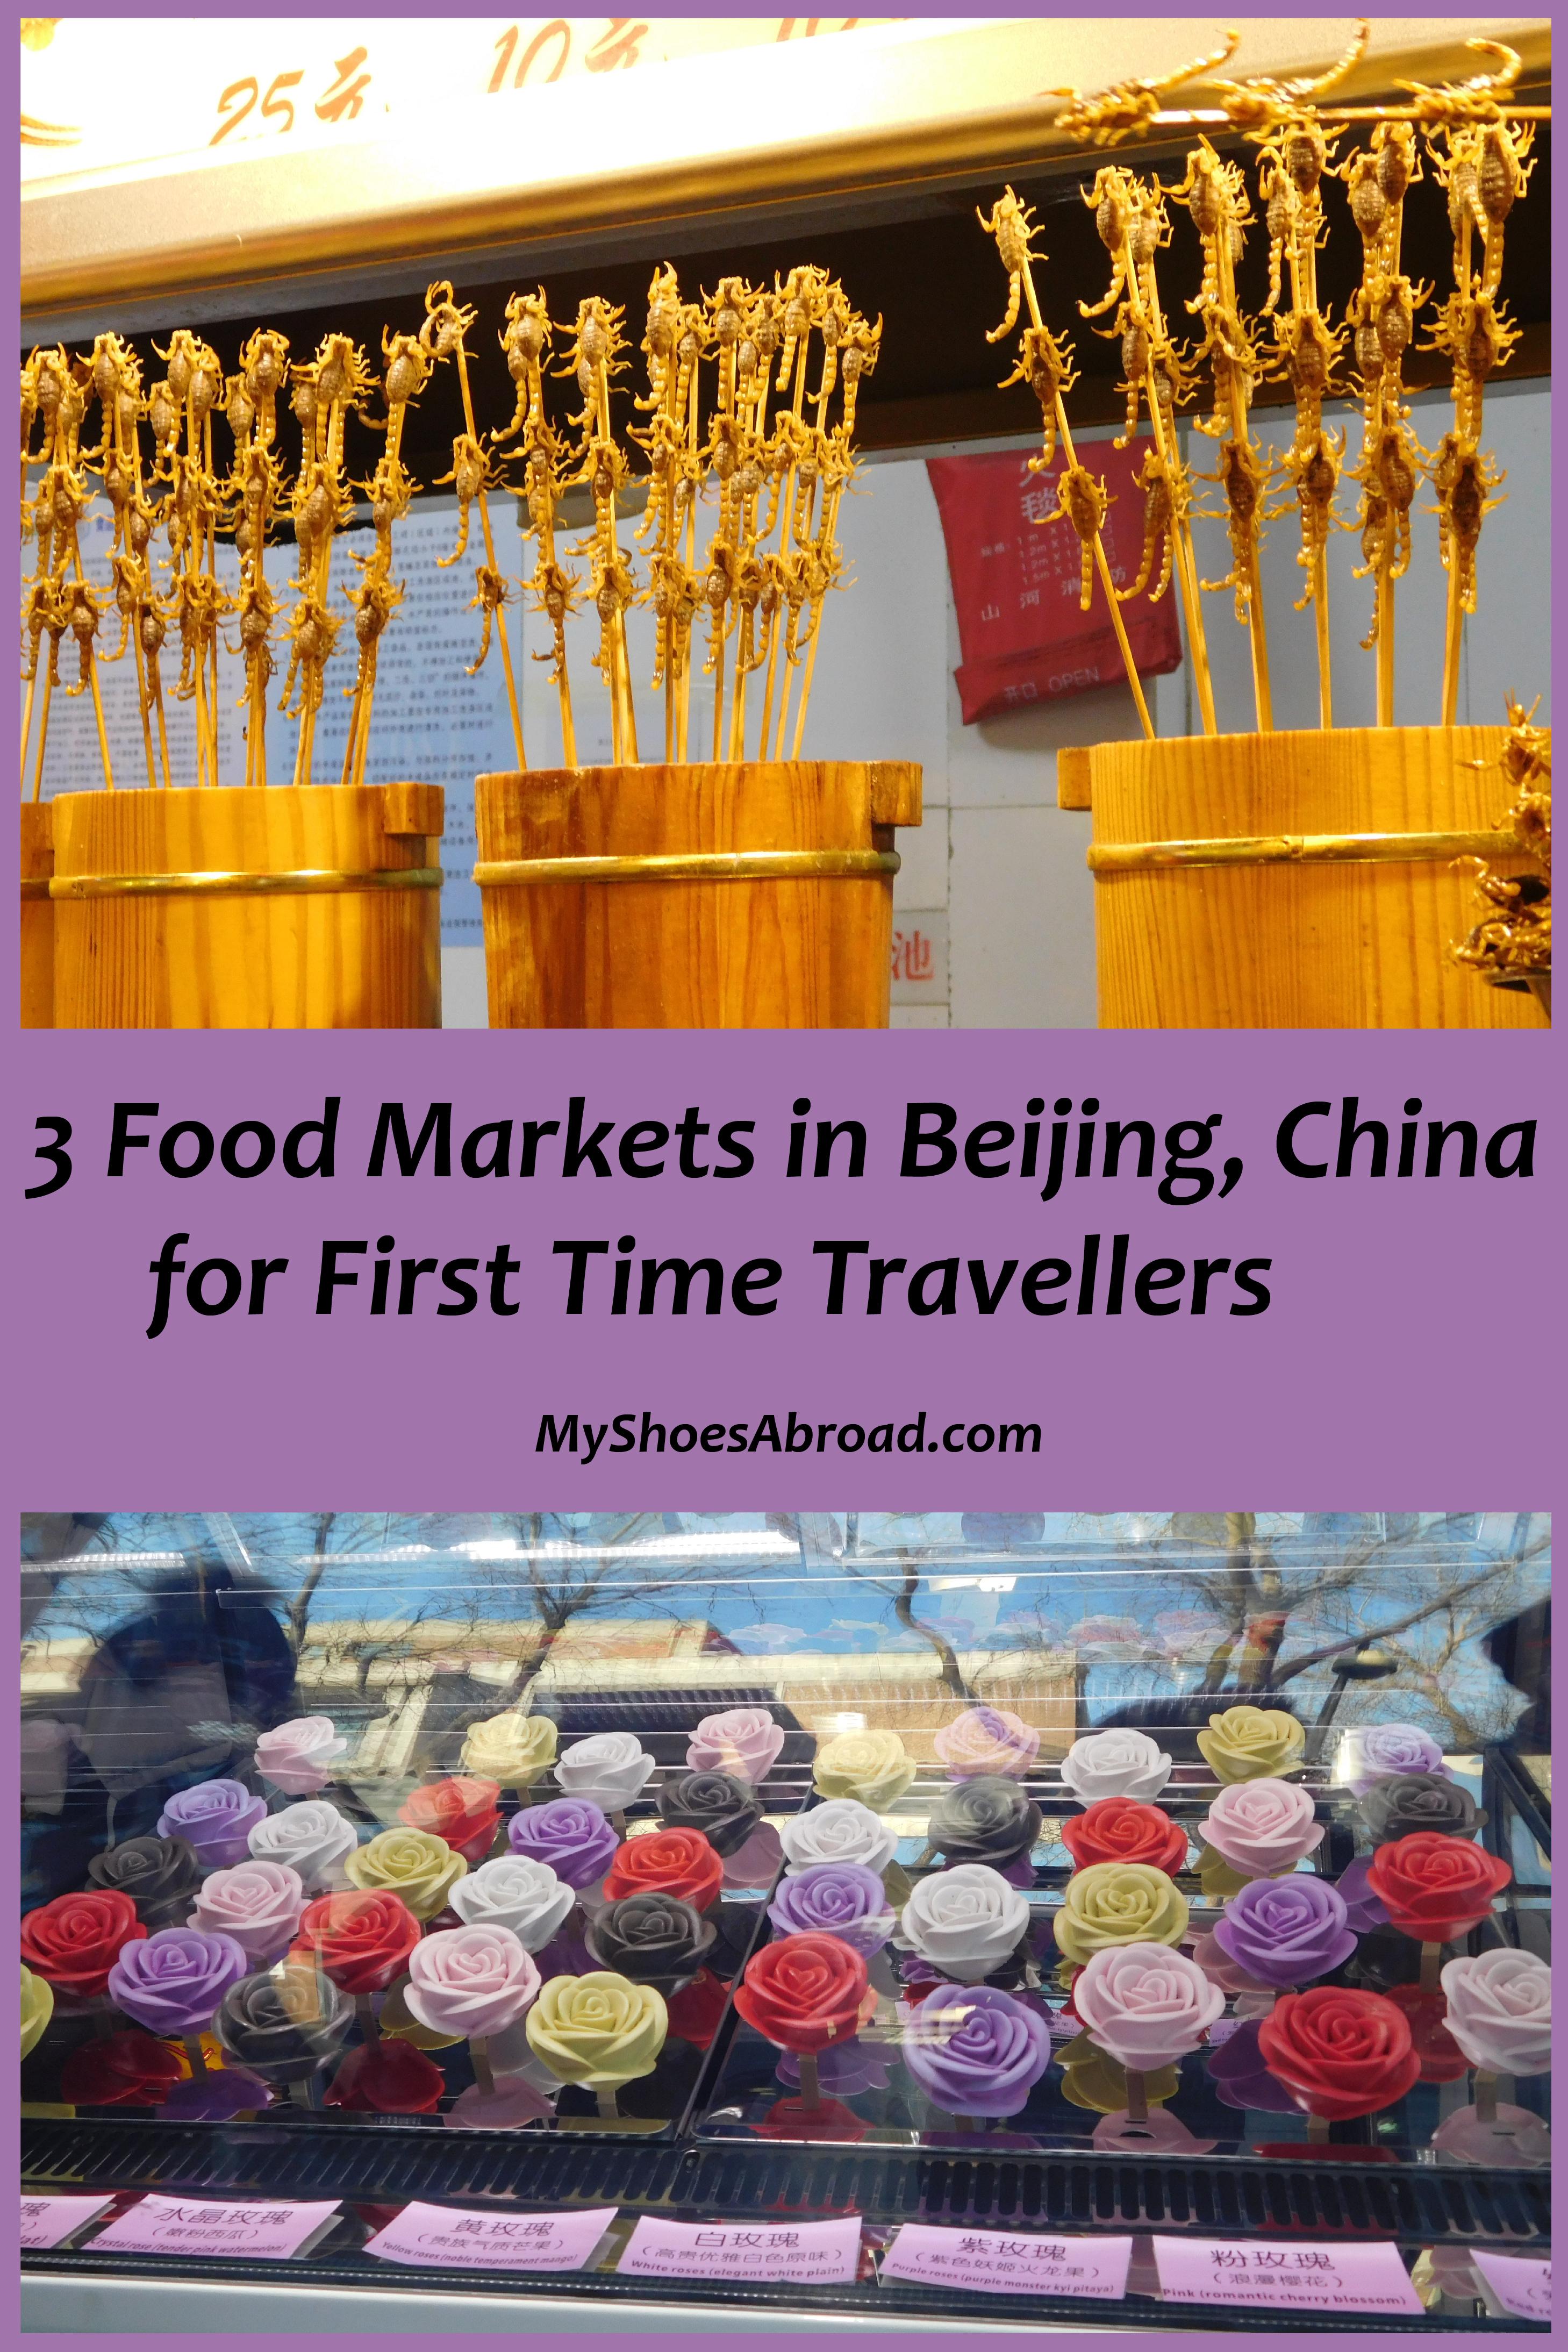 3 food markets in Beijing